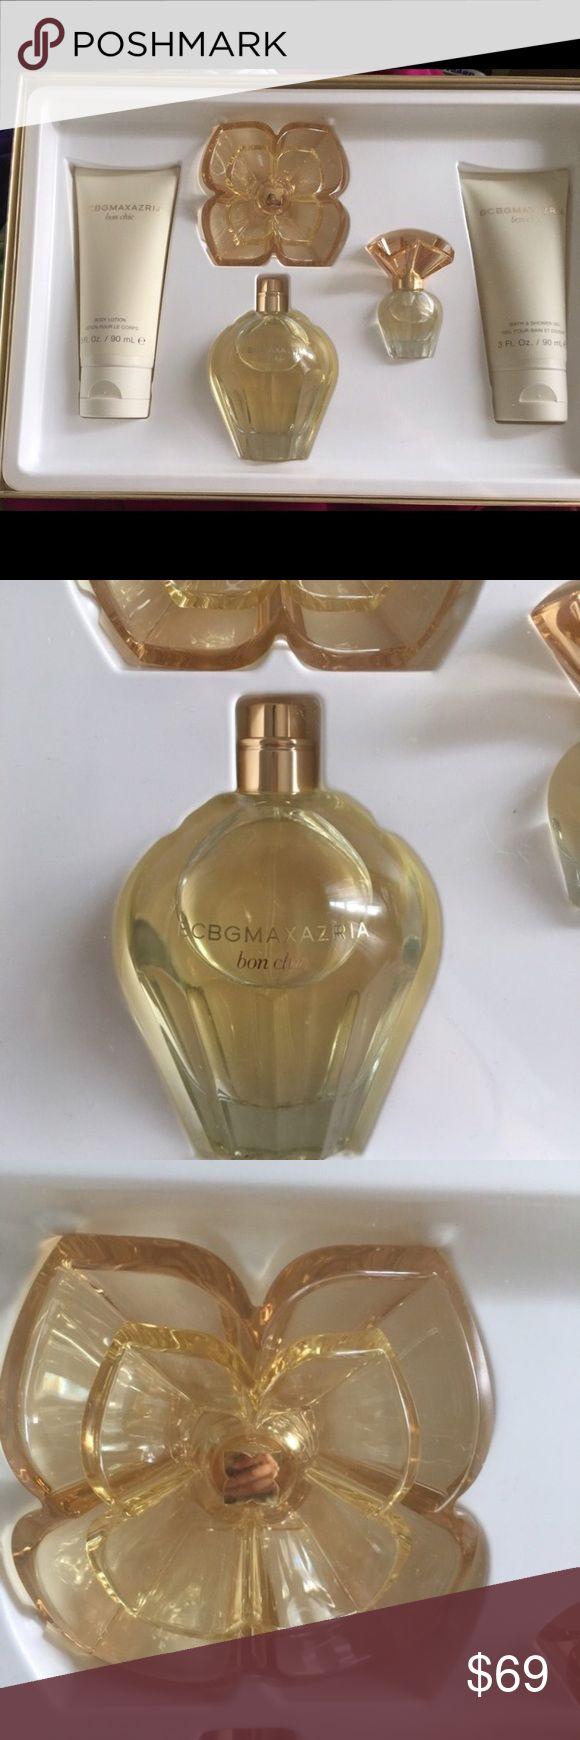 BCBGMaxazria Bon Chic perfume set Sealed in box. 3.4 fl. Oz Eau de parfum natural spray. 3fl oz body lotion. 3 fl oz bath and shower gel. .25 Felix Eau de parfumerie natural spray BCBGMaxAzria Makeup